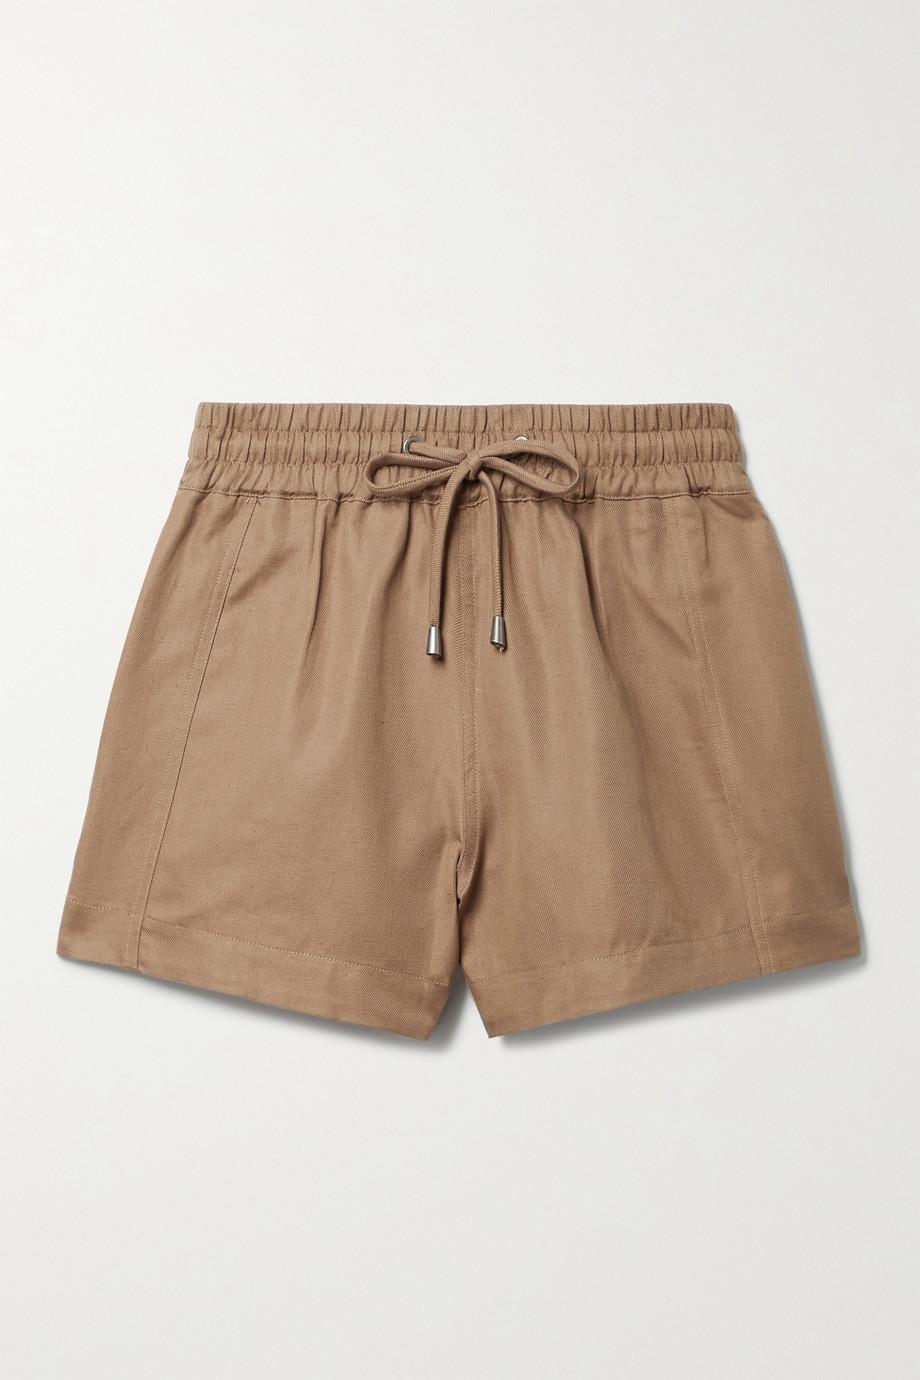 APIECE APART Trail linen and cotton-blend twill shorts